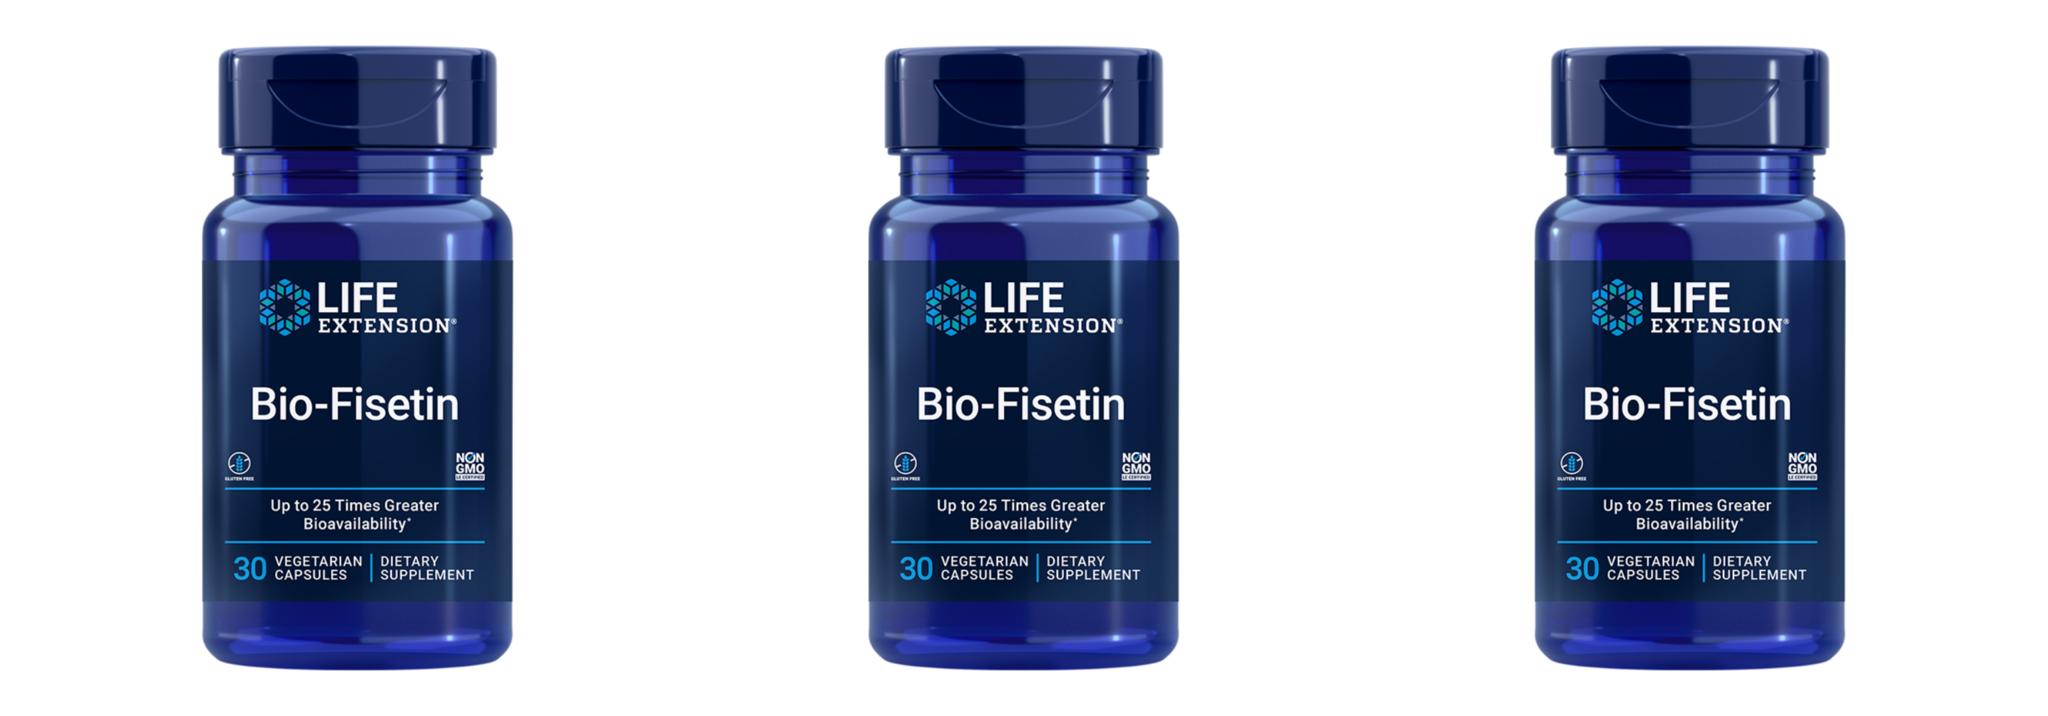 Life Extension Bio-Fisetin, 30 Vegetarian Capsules, 3-packs